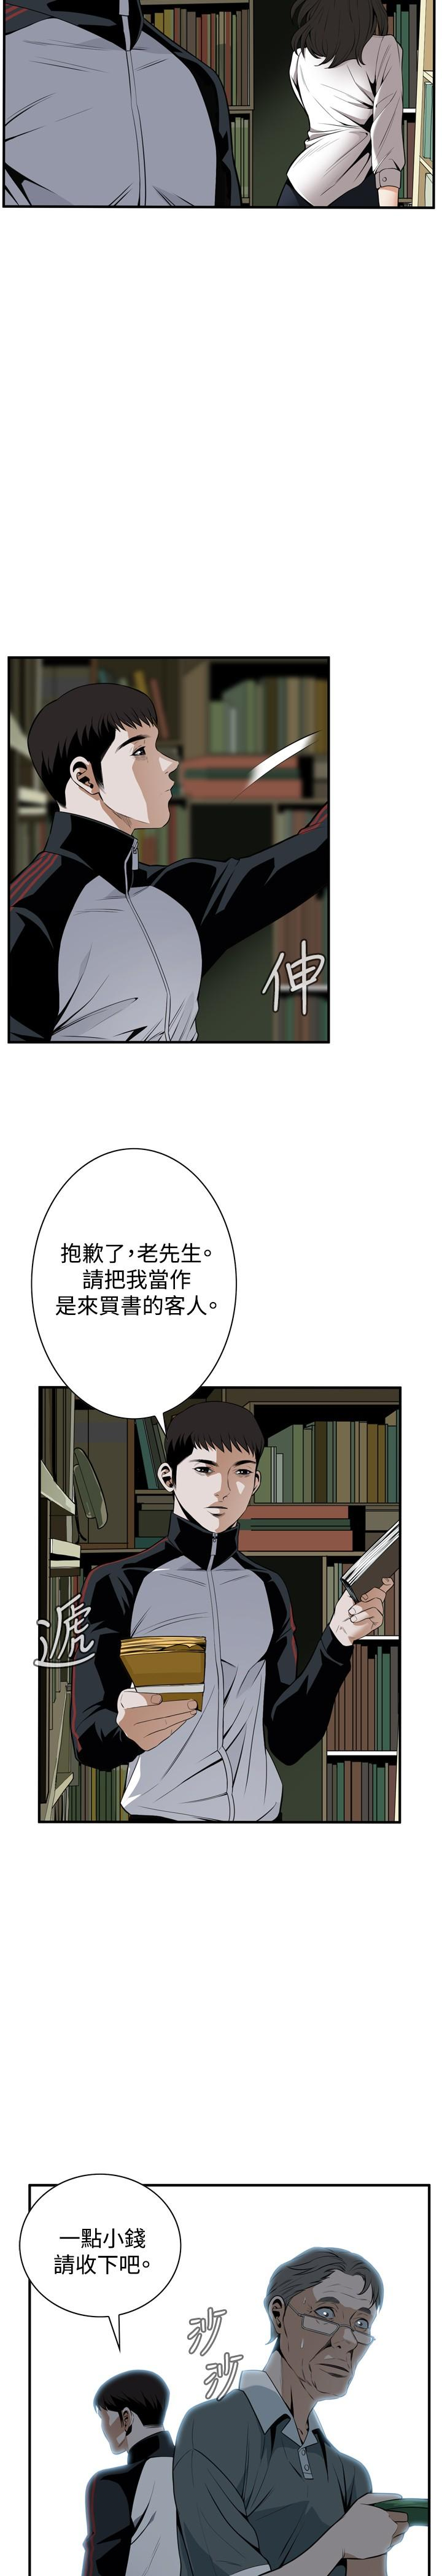 Take a Peek 偷窥 Ch.39~55 [Chinese]中文 90